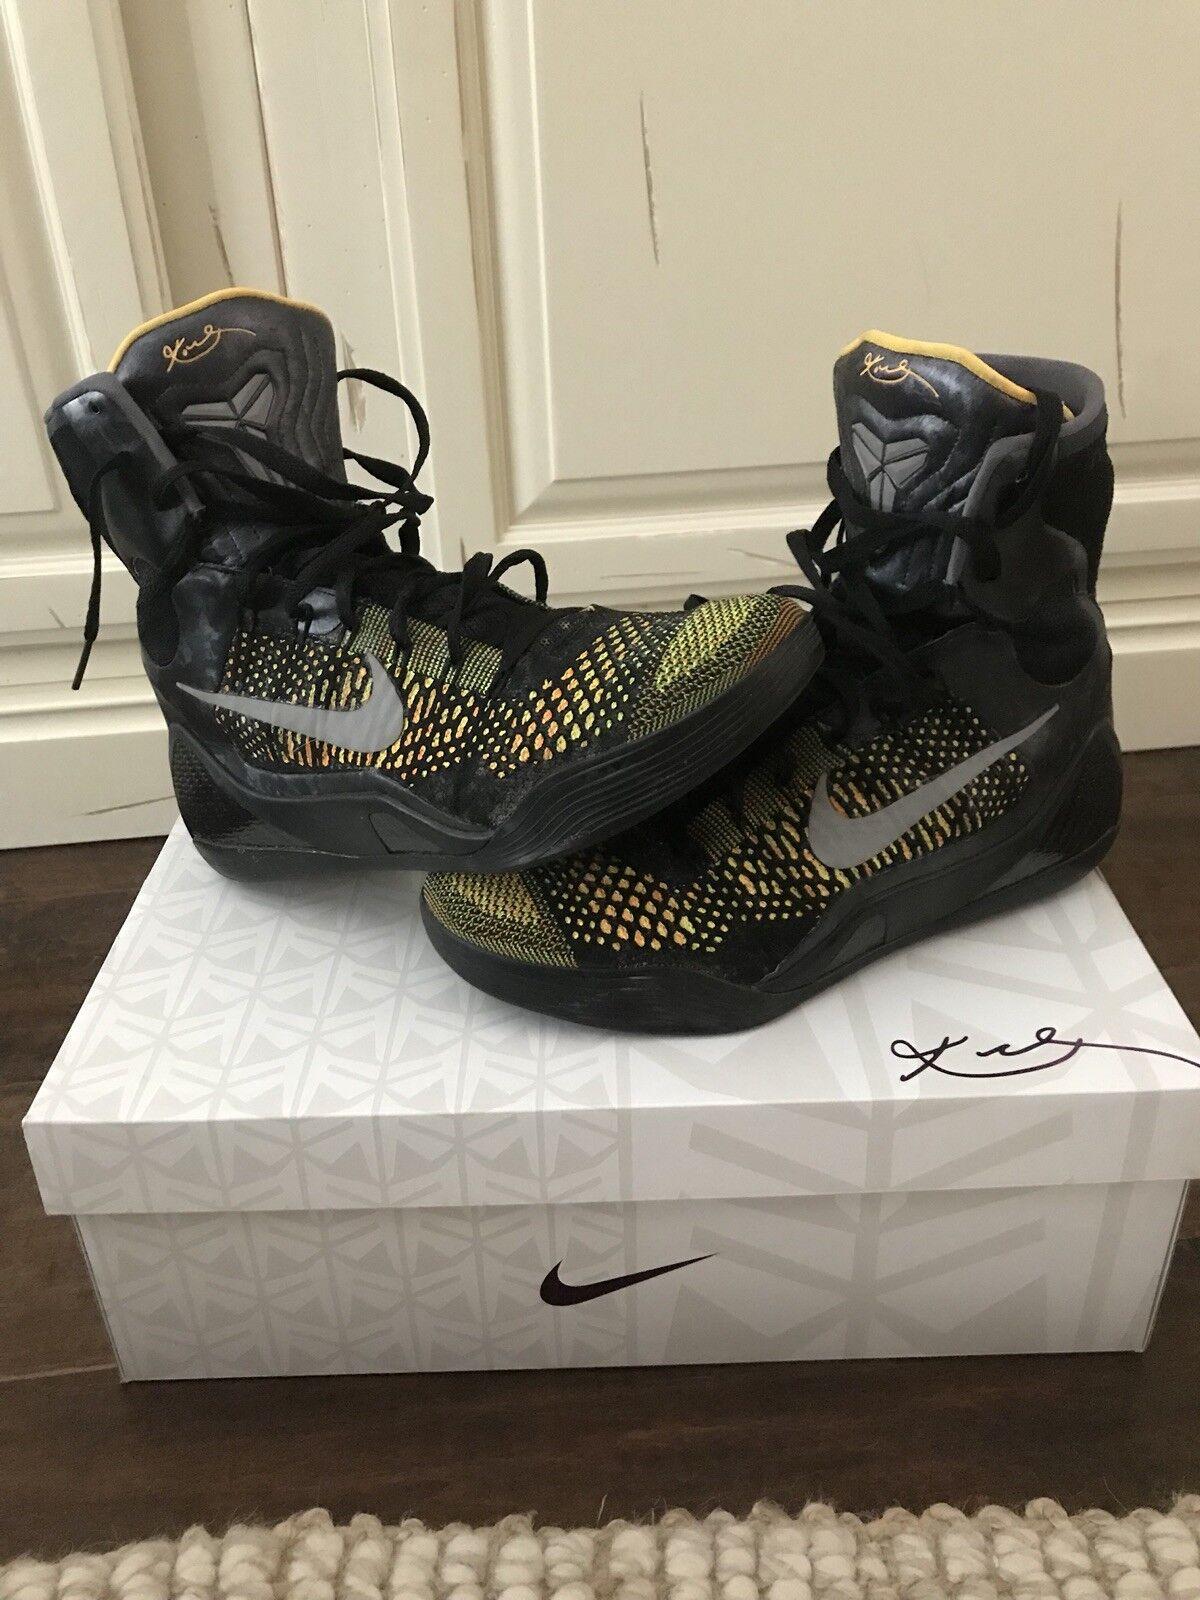 Nike Kobe ix 9 Elite Inspiration, Size 10